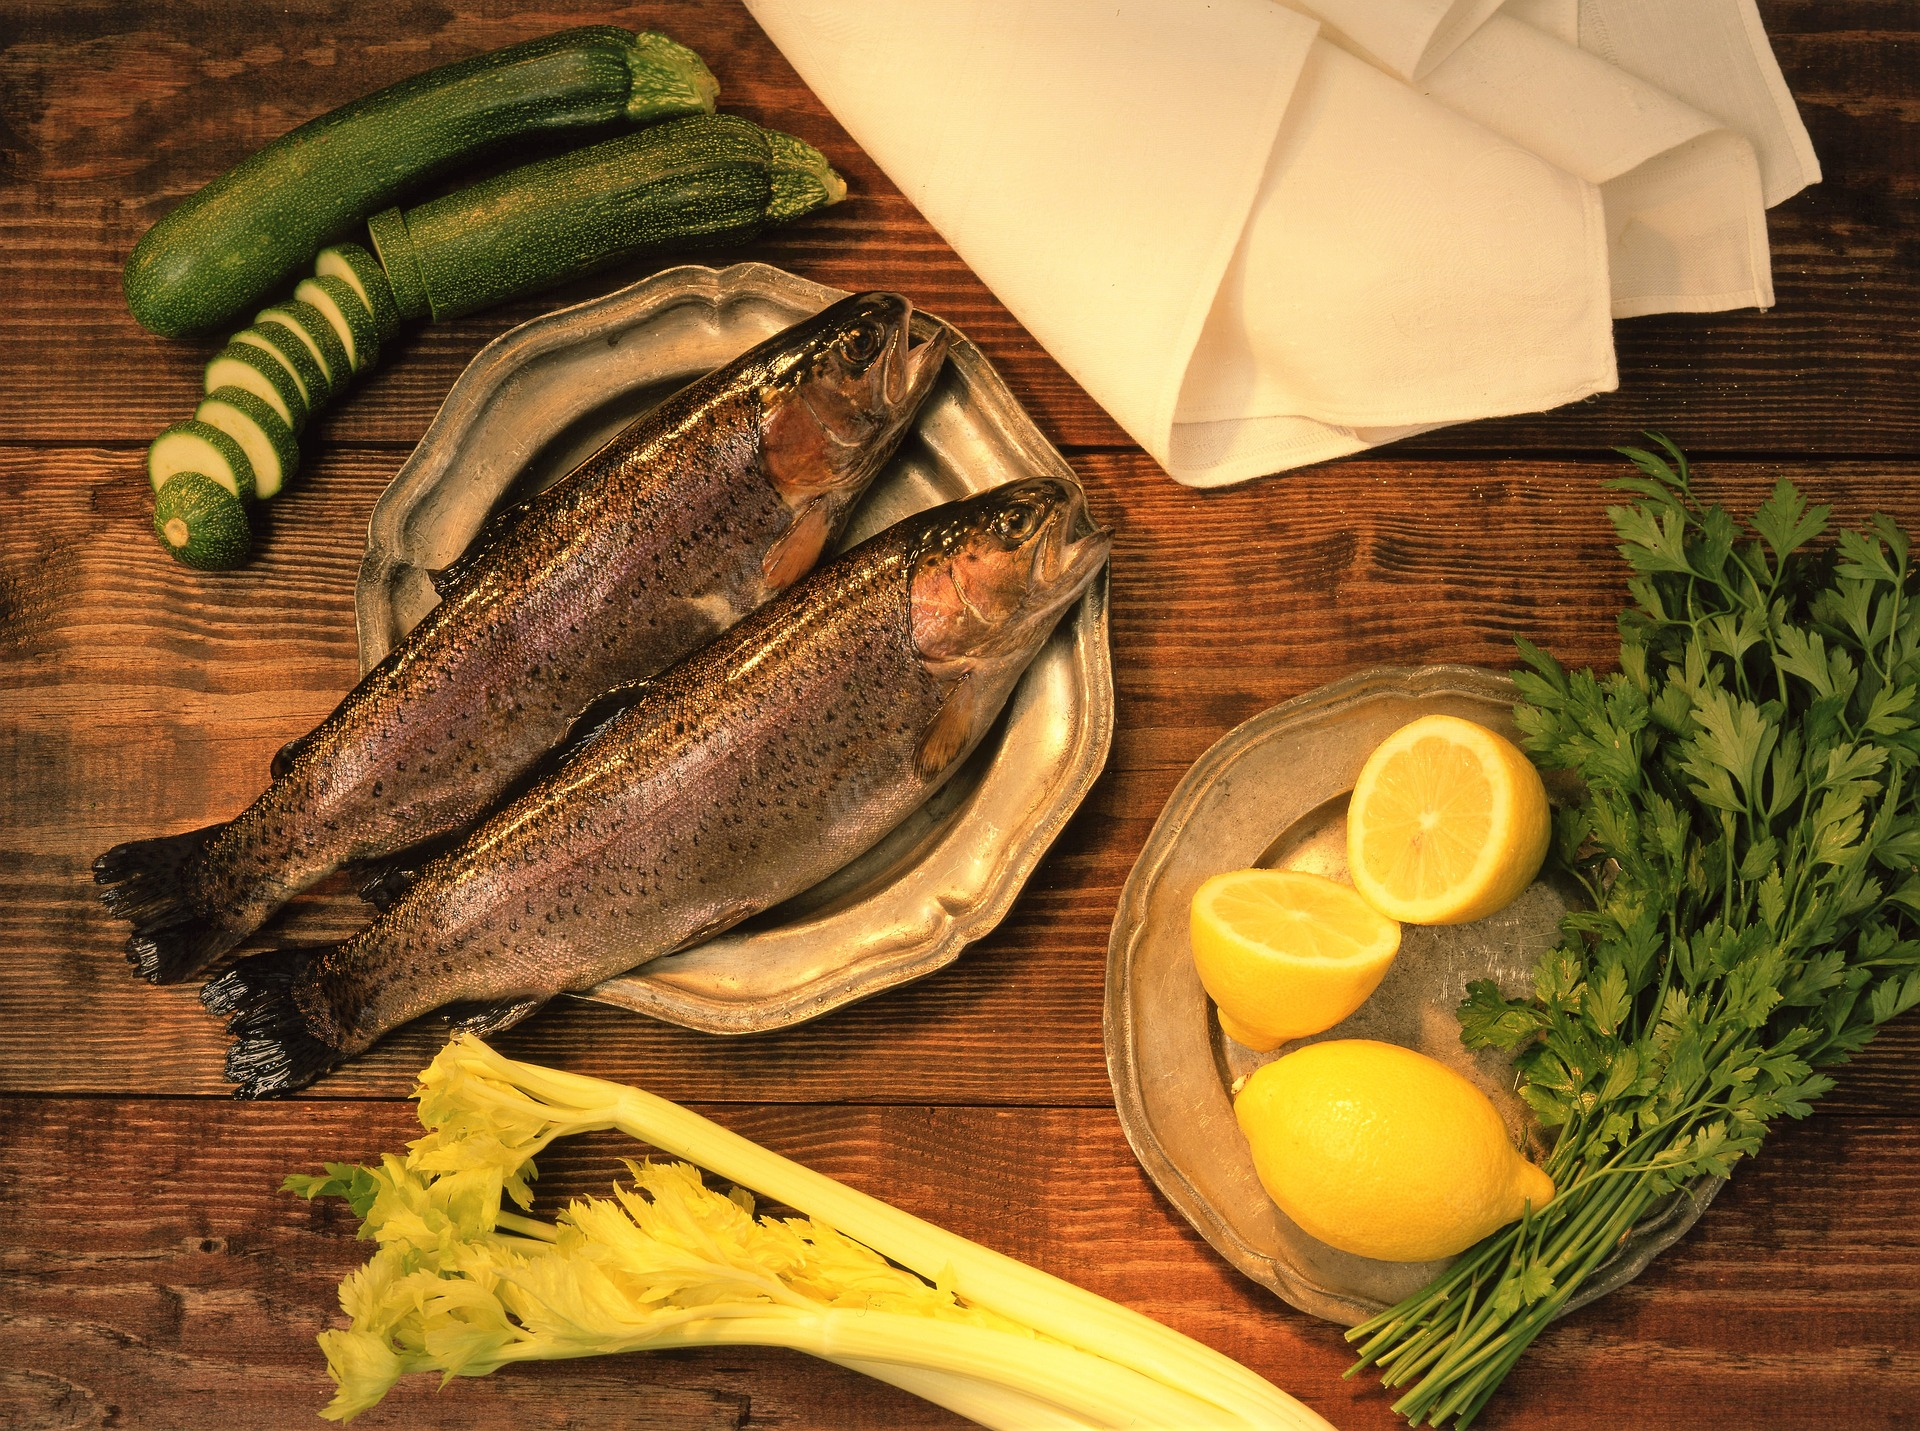 fish-supper-3805035_1920.jpg